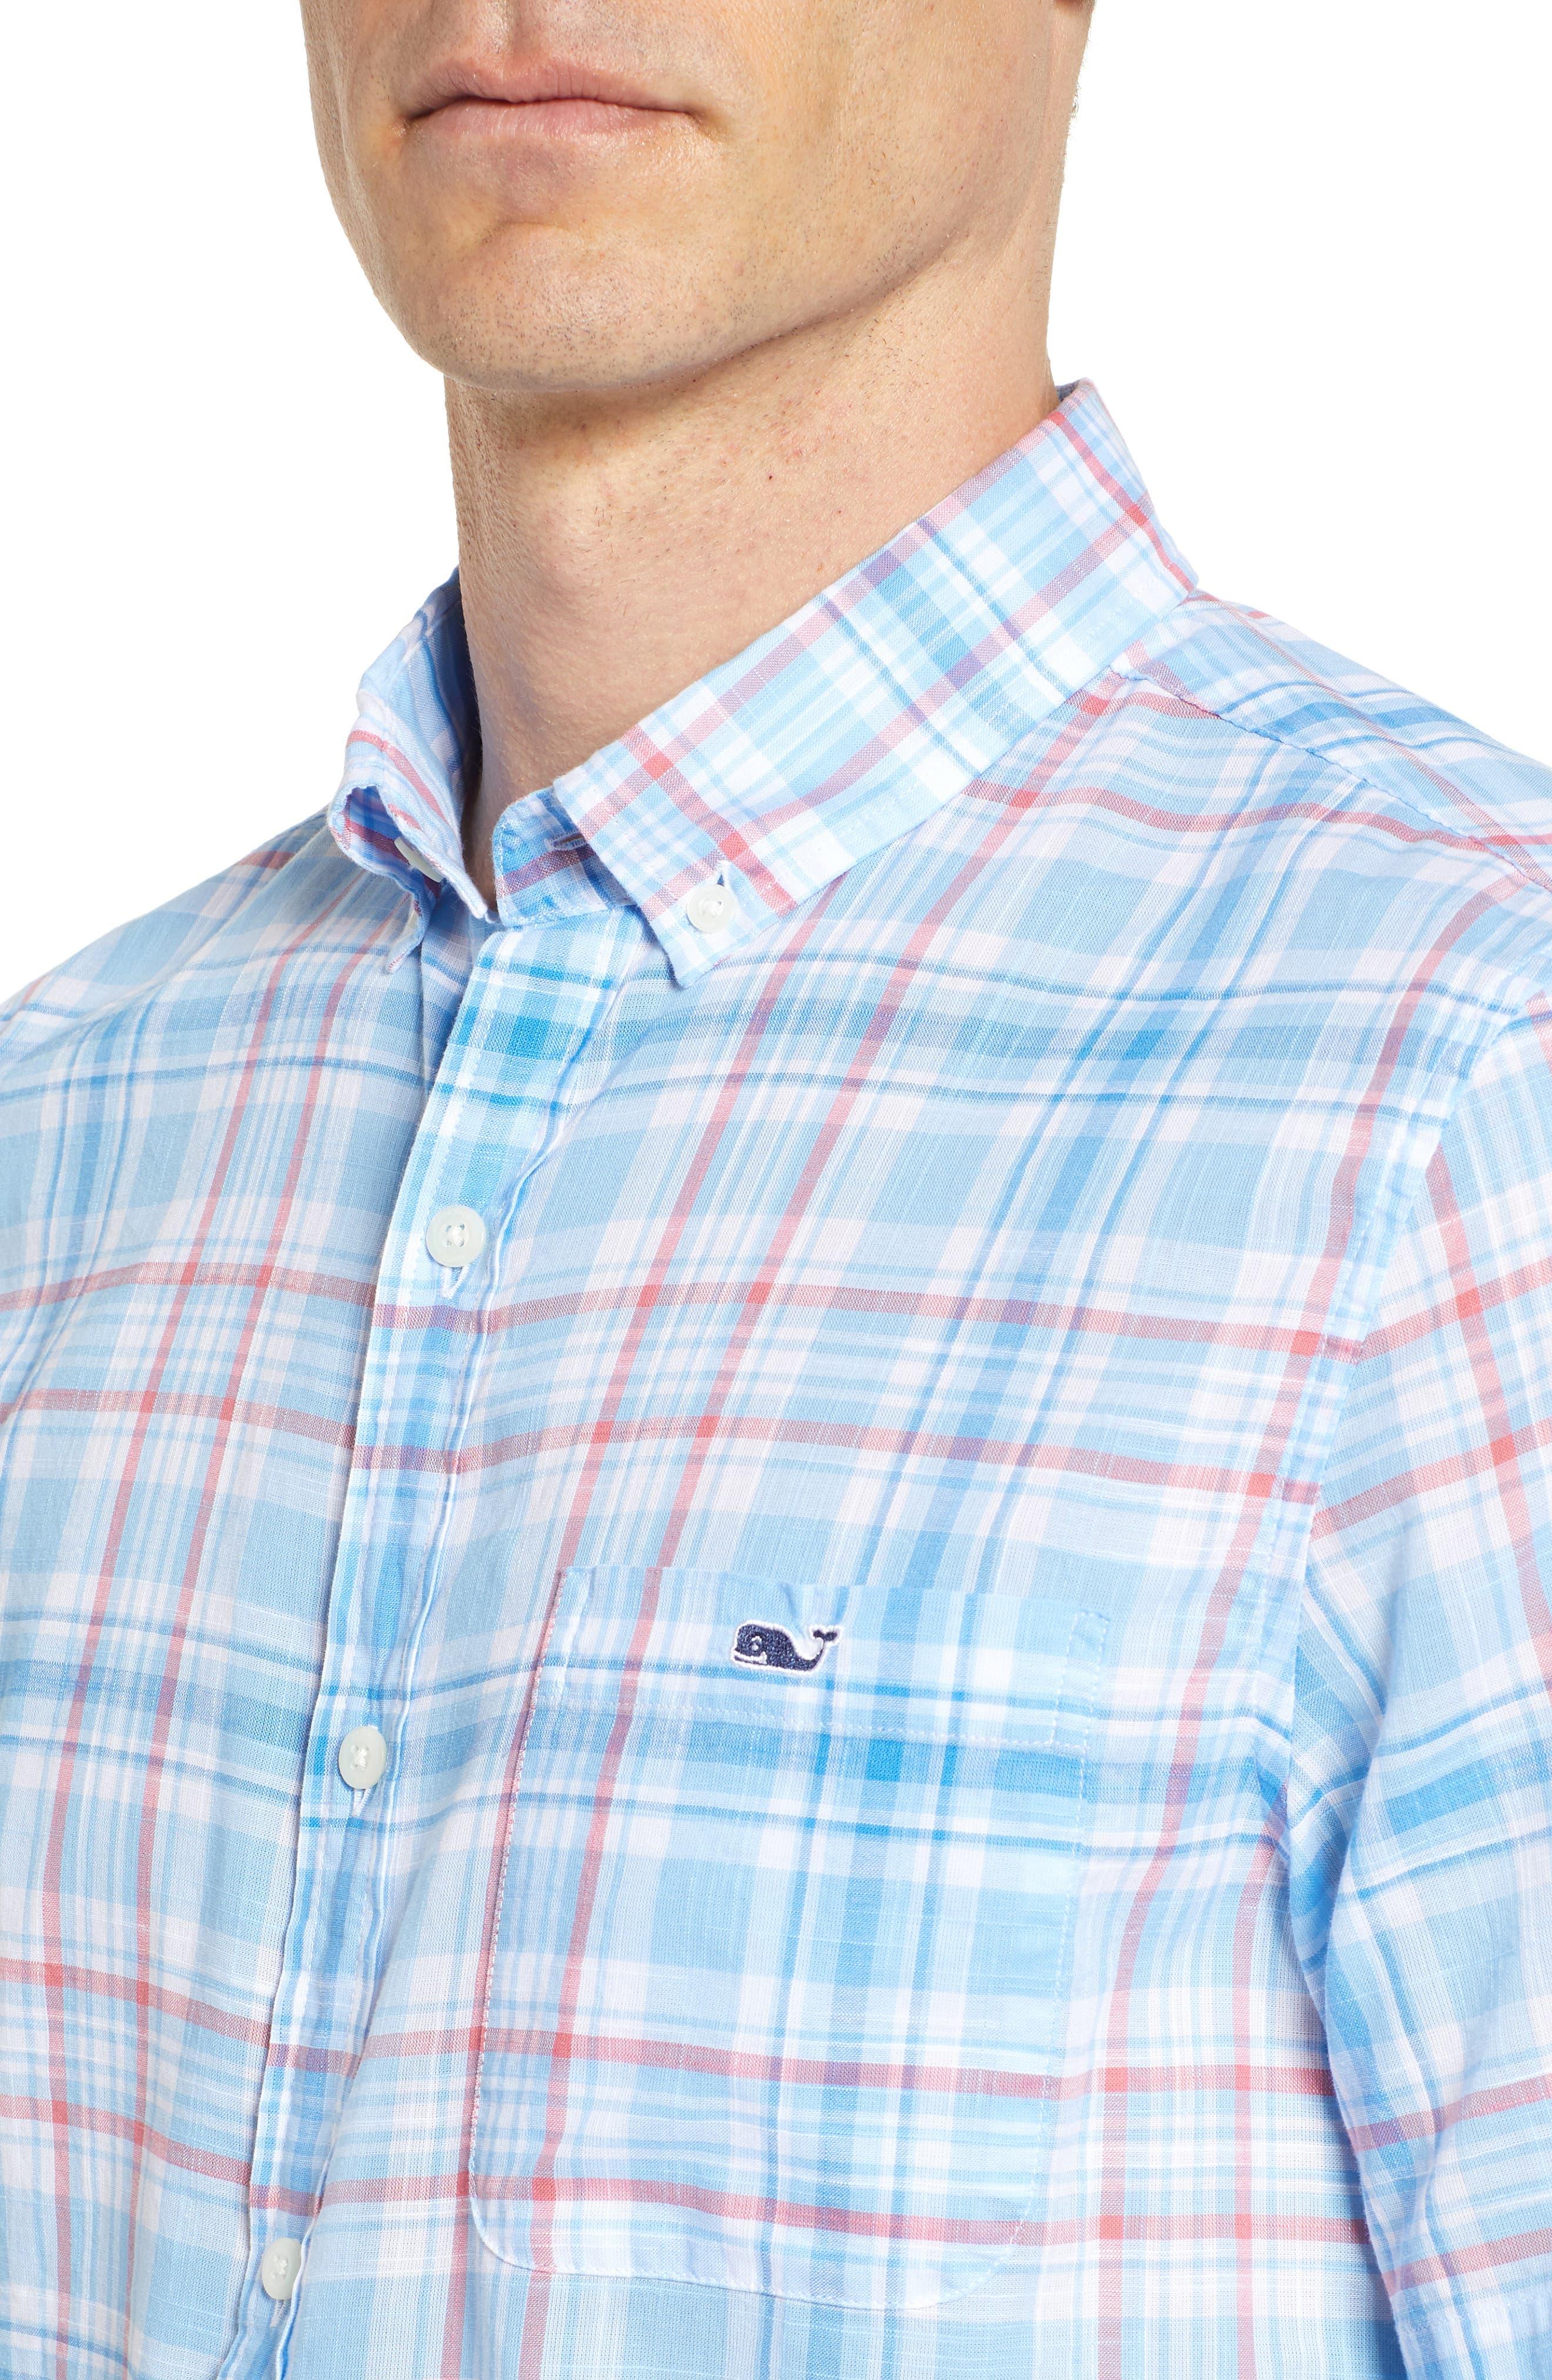 Fire Road Tucker Slim Fit Plaid Sport Shirt,                             Alternate thumbnail 4, color,                             484